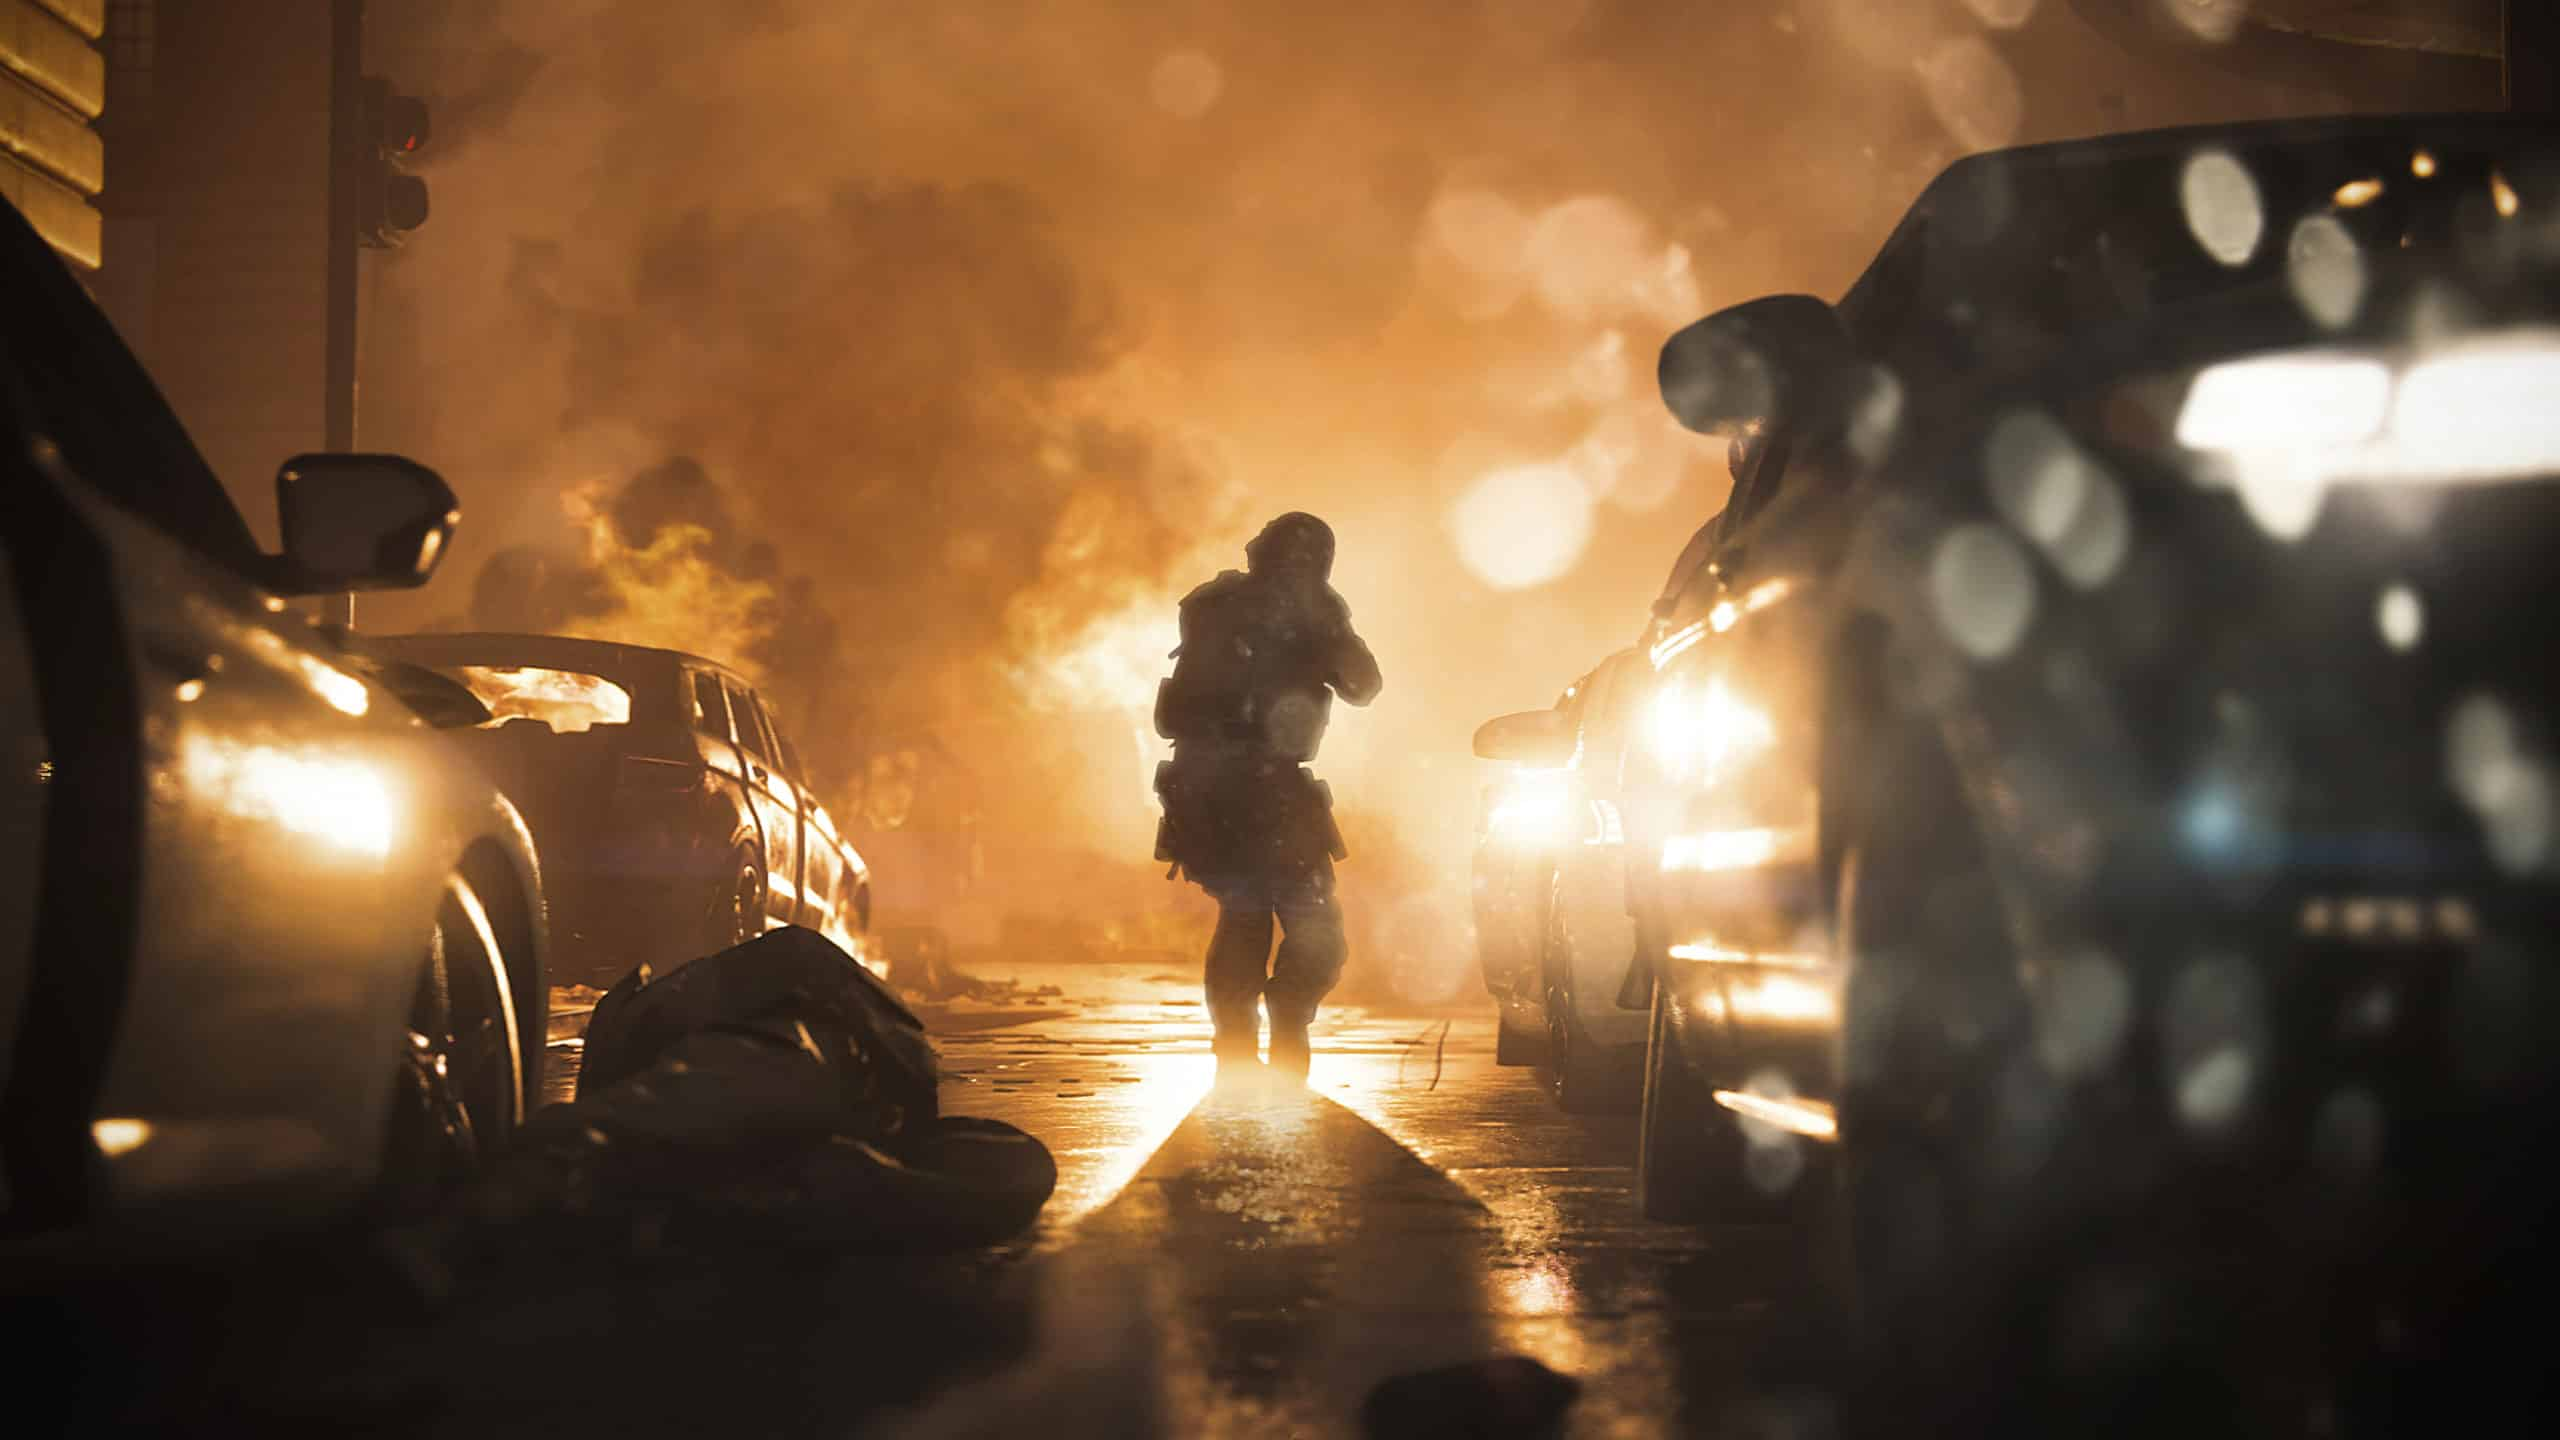 Call of duty 4 mondern warfare